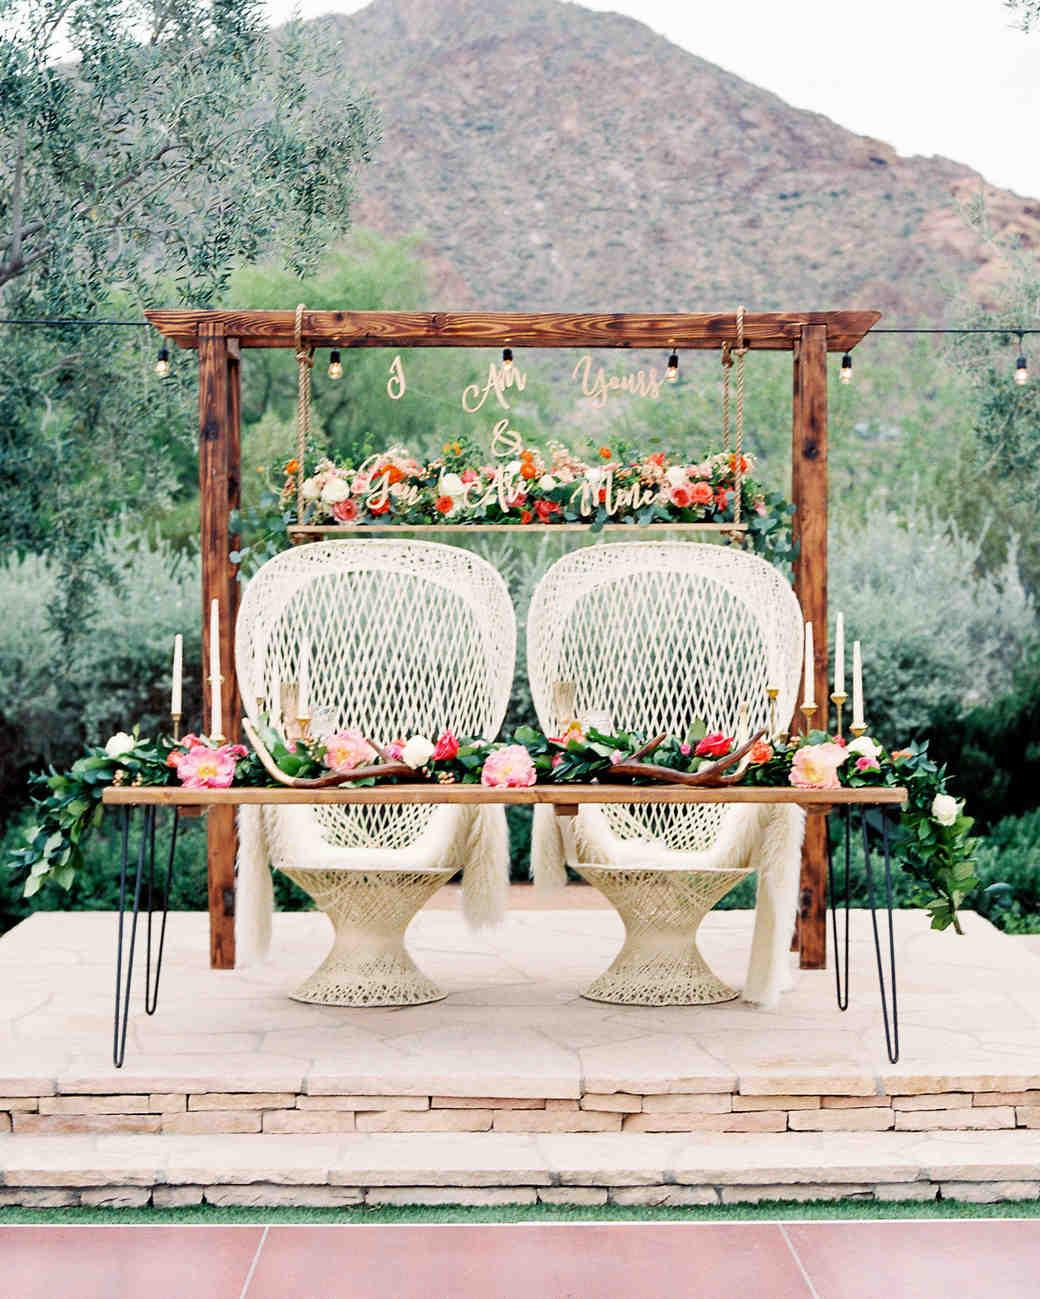 Bohemian Wedding Reception: A Bright Wedding In Arizona With Boho Touches